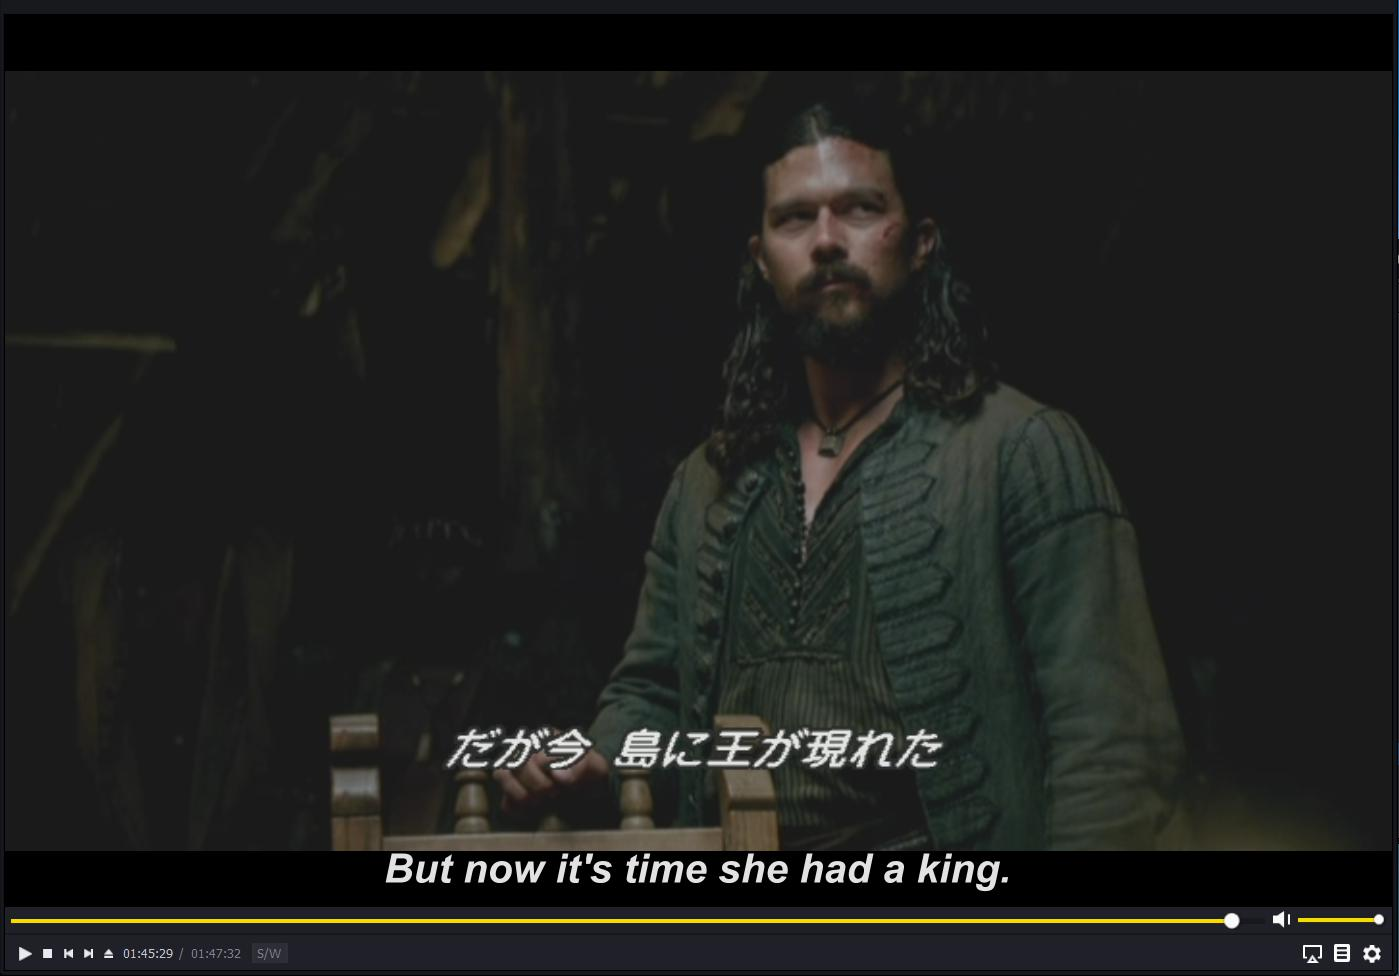 It's time + 節(仮定法)